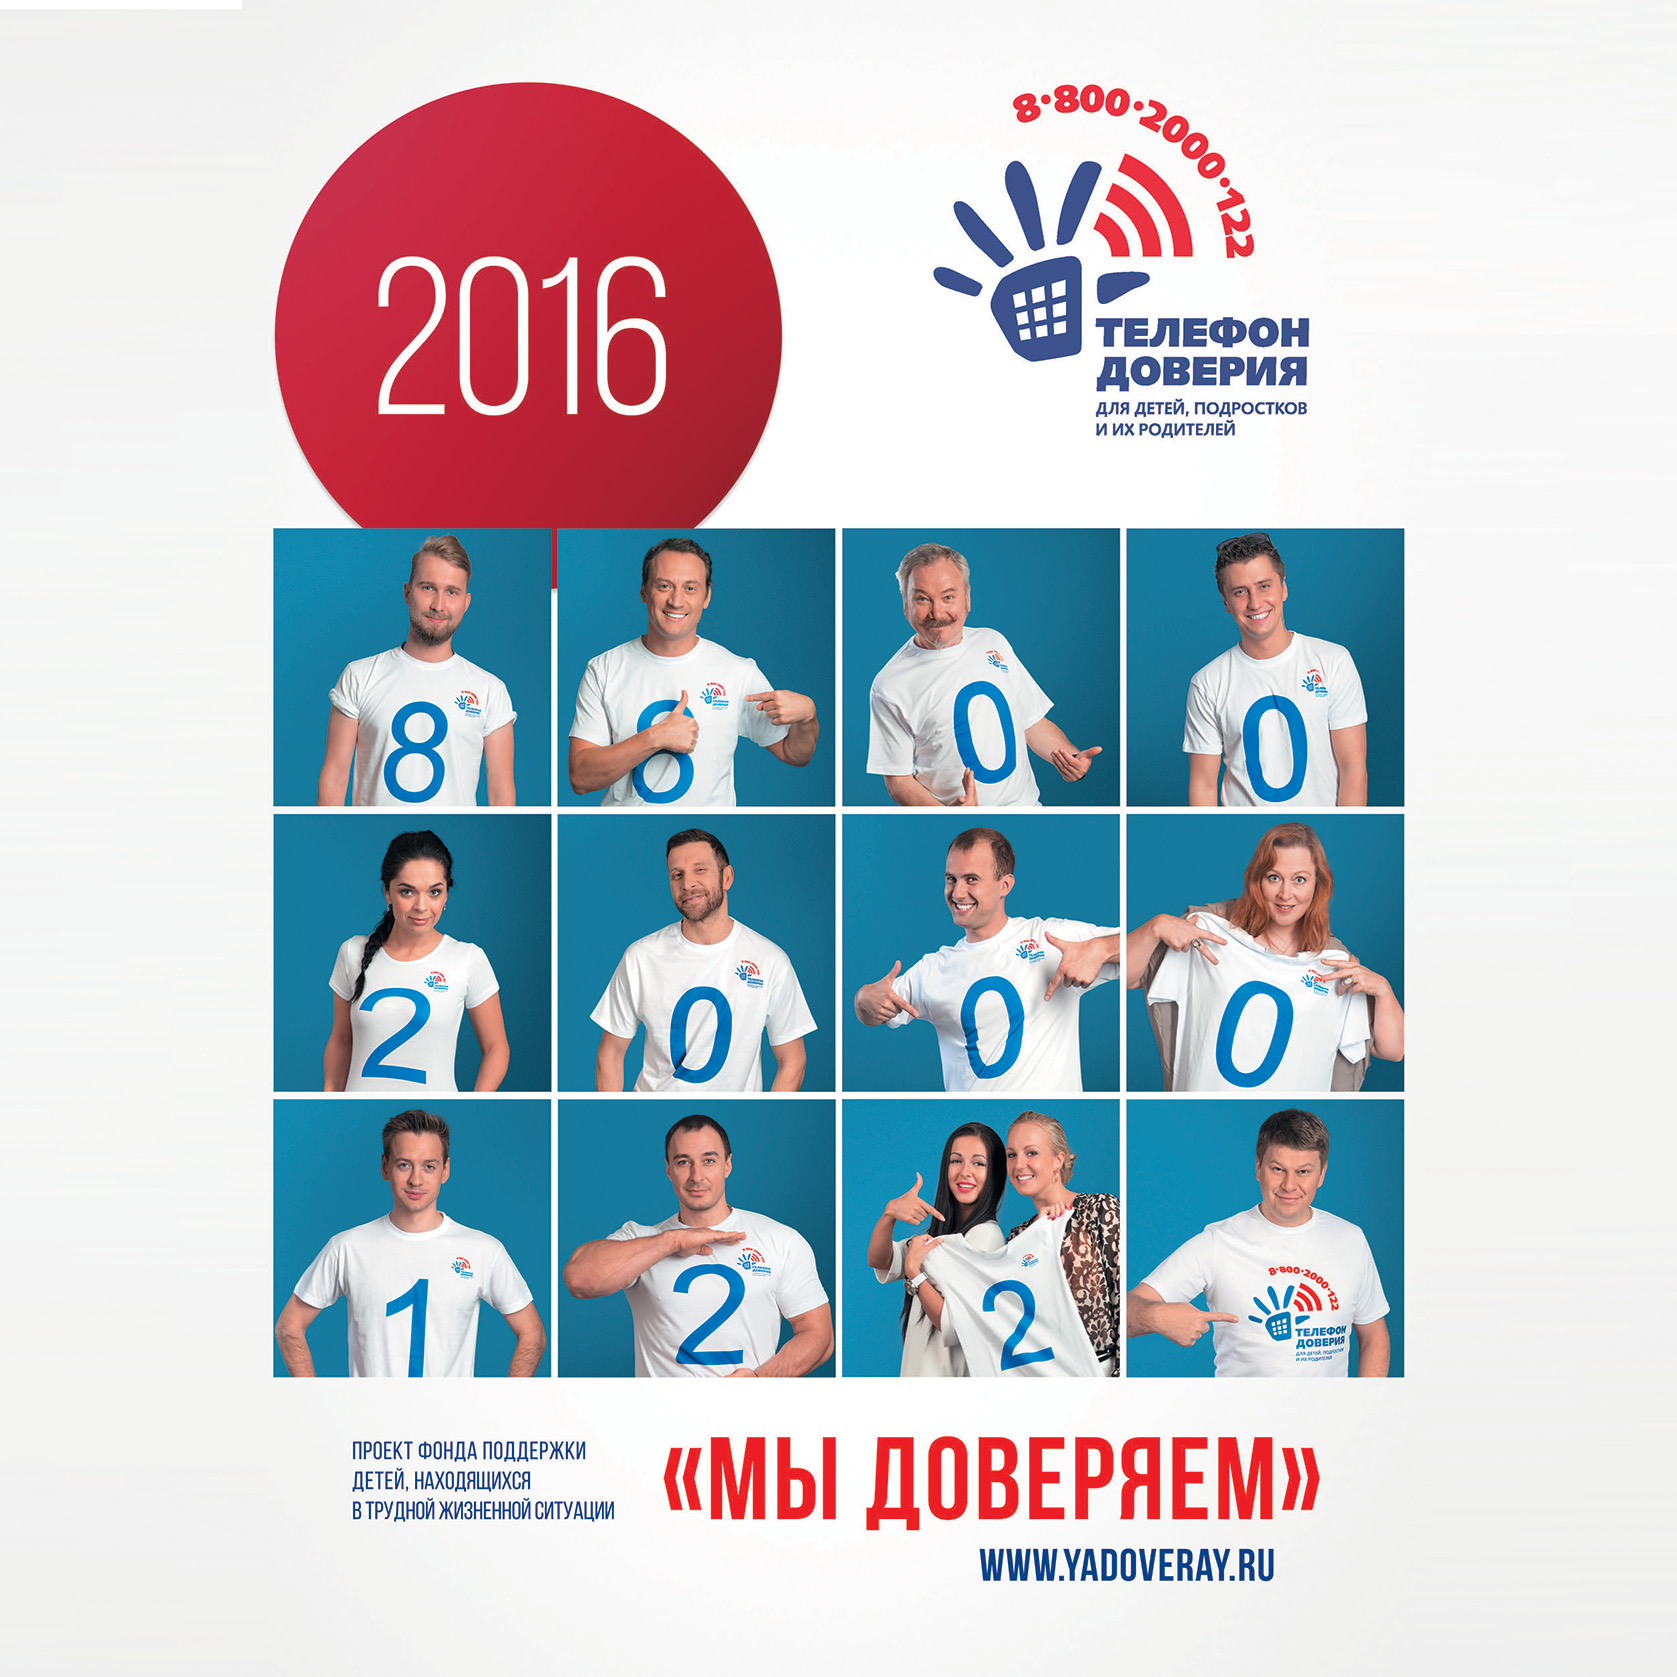 calendar2015_Page_01 copy.jpg